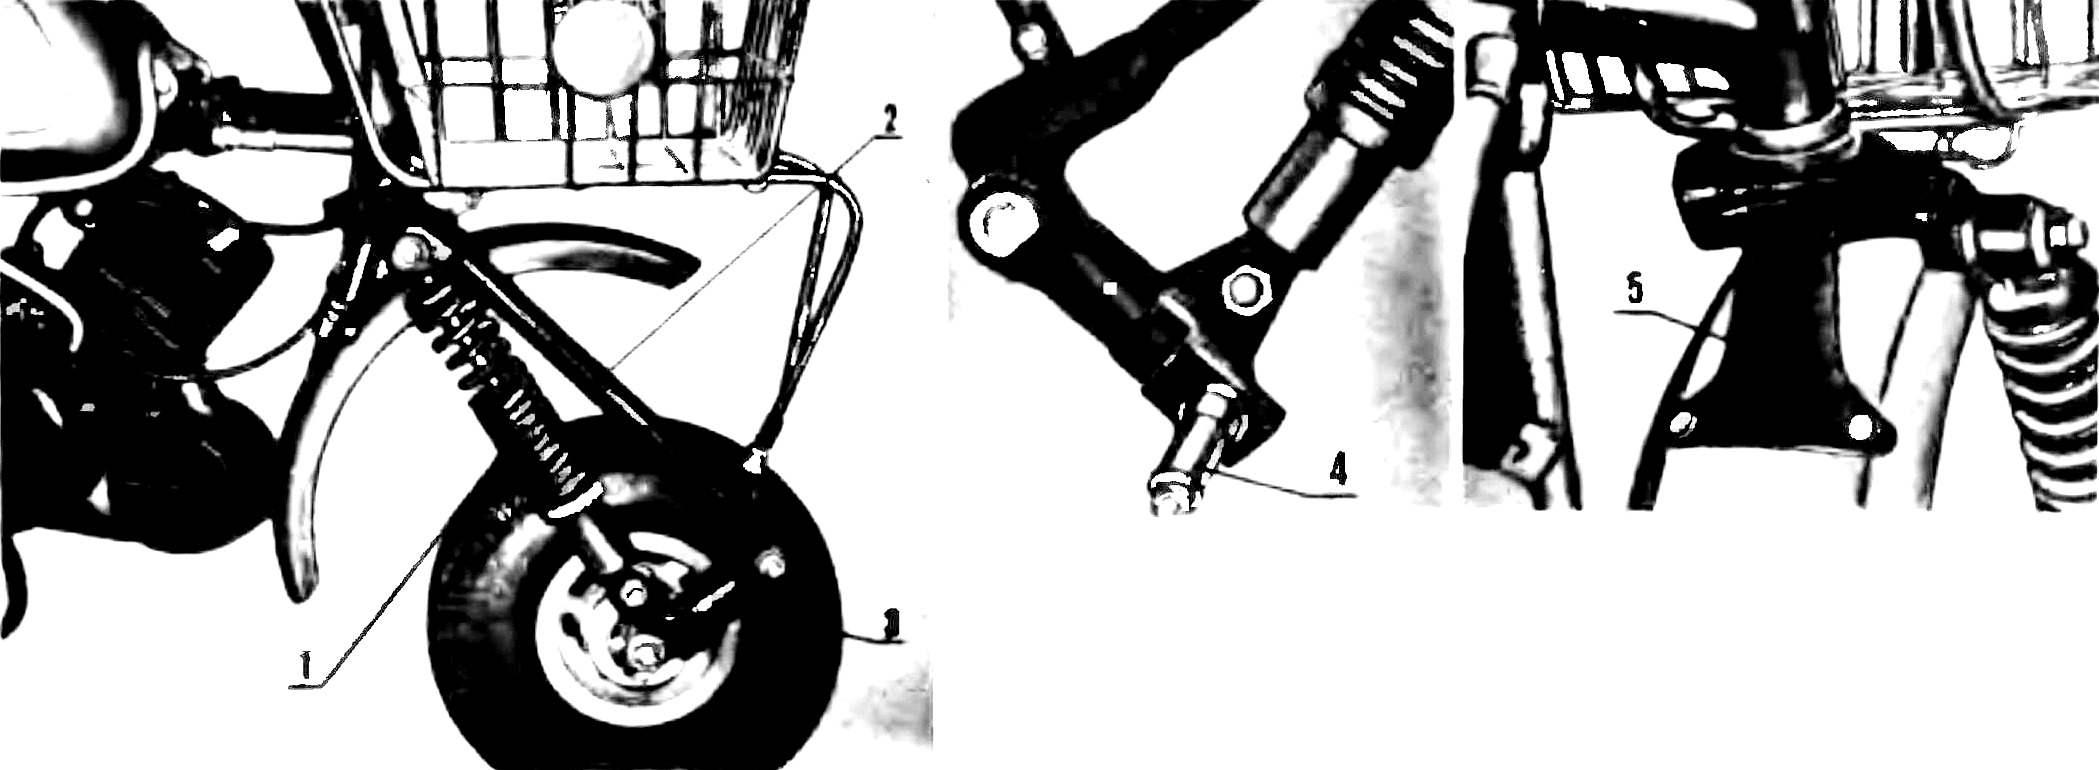 Front suspension.